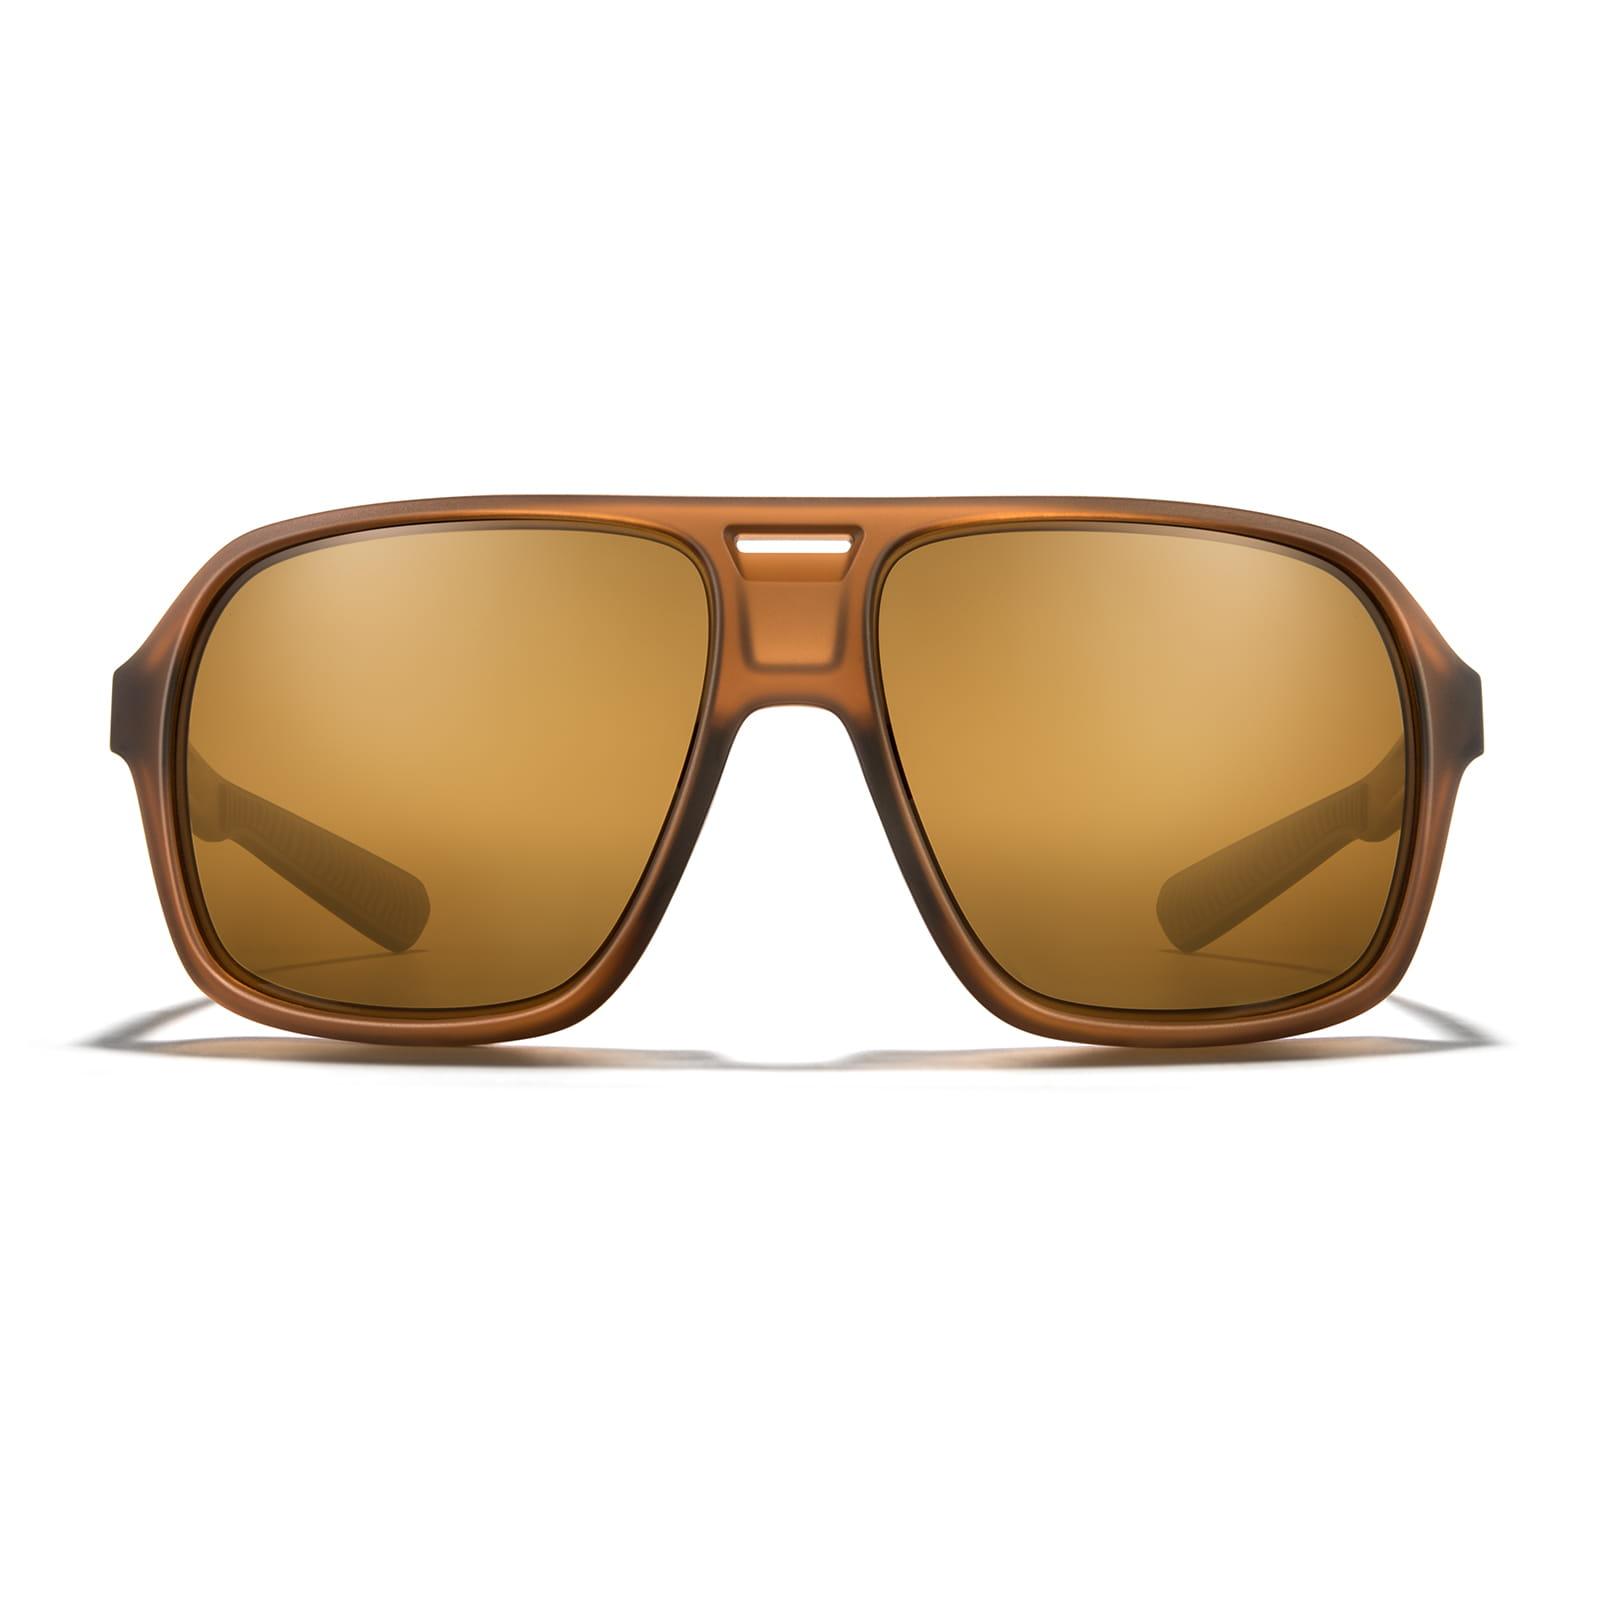 Torino Sunglasses - Retro Race-Inspired Sunglasses | ROKA